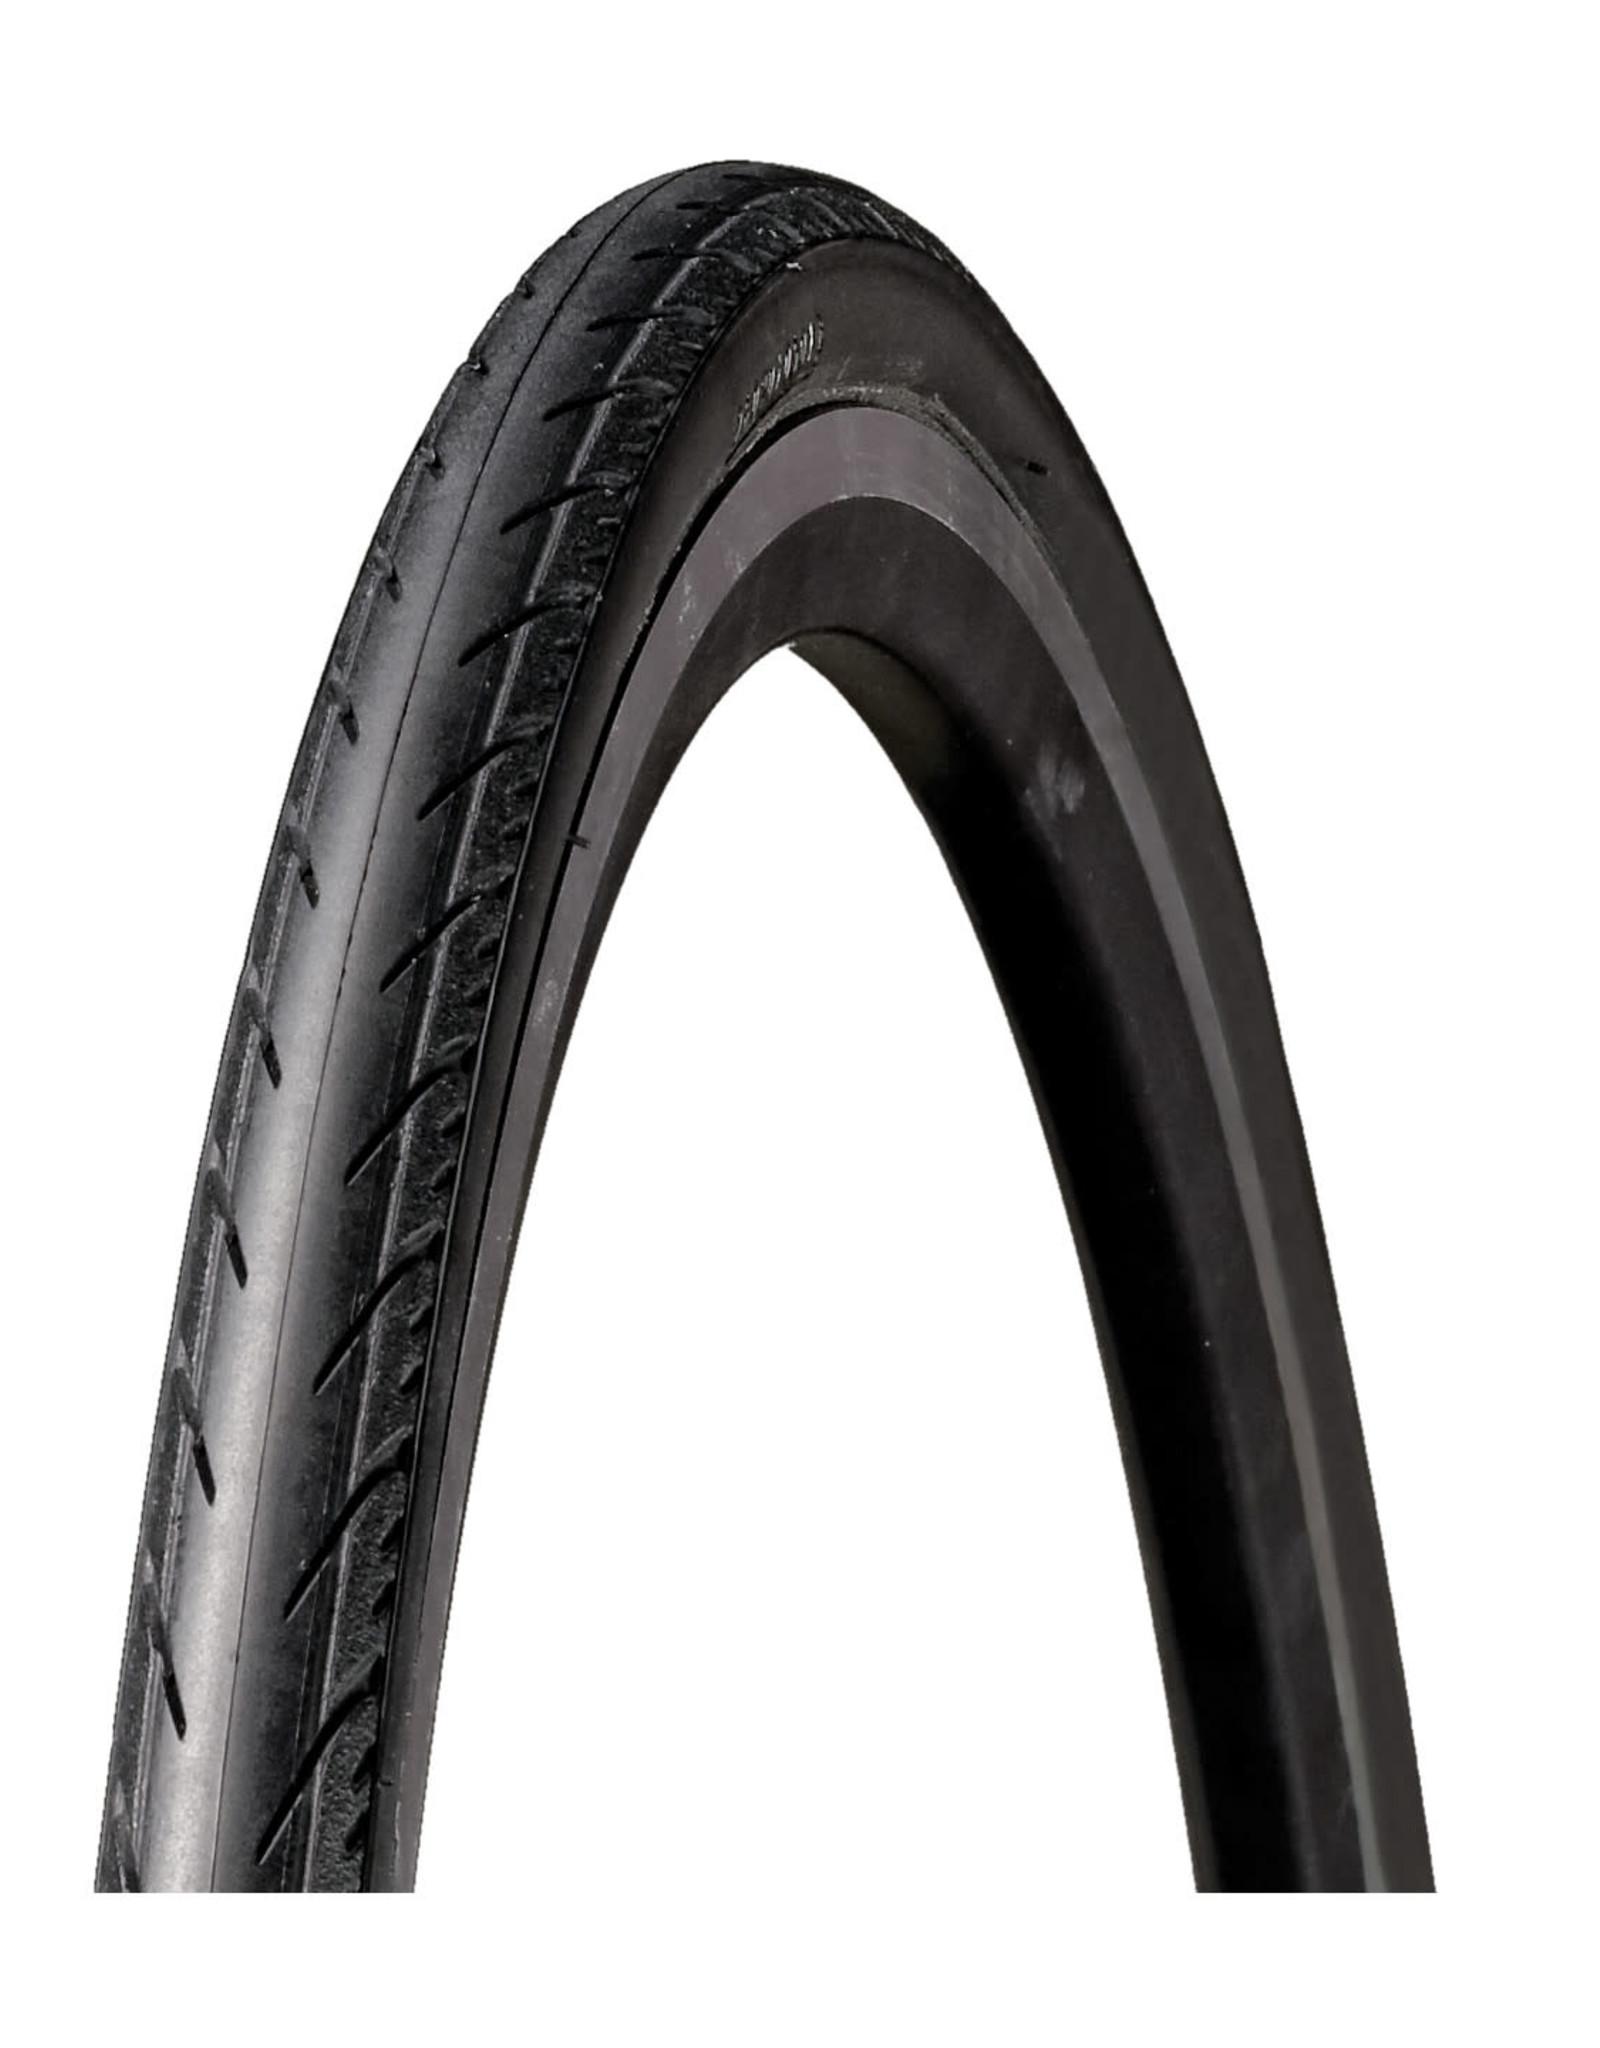 BONTRAGER Bontrager T1 27 x 1-1/4 Blackwall Tire